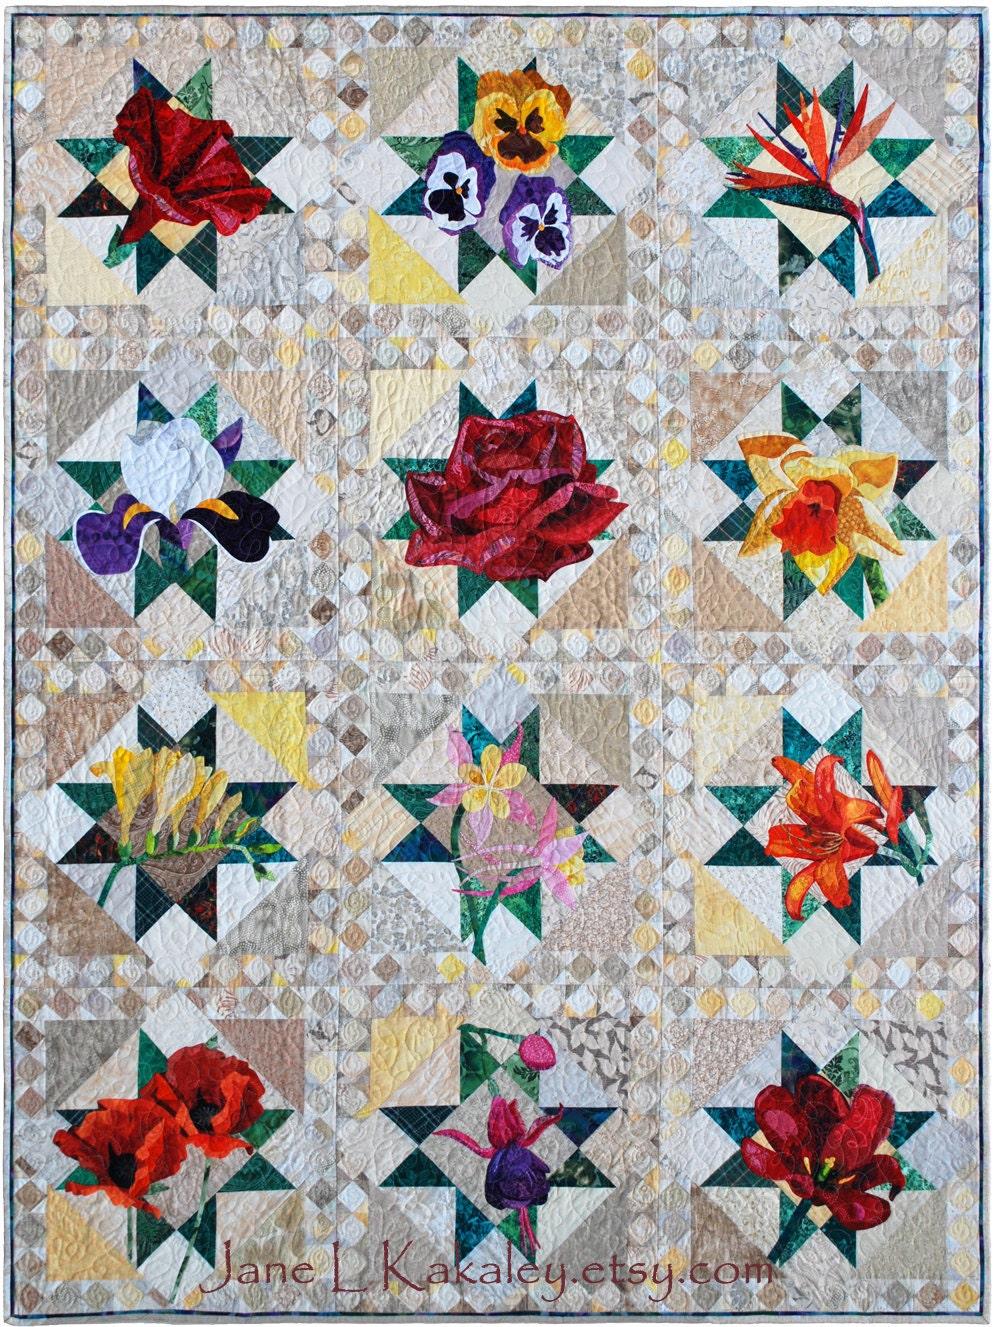 Quilt Pattern - PDF - Bird of Paradise Applique Art Quilt Pattern ... : applique quilts patterns - Adamdwight.com